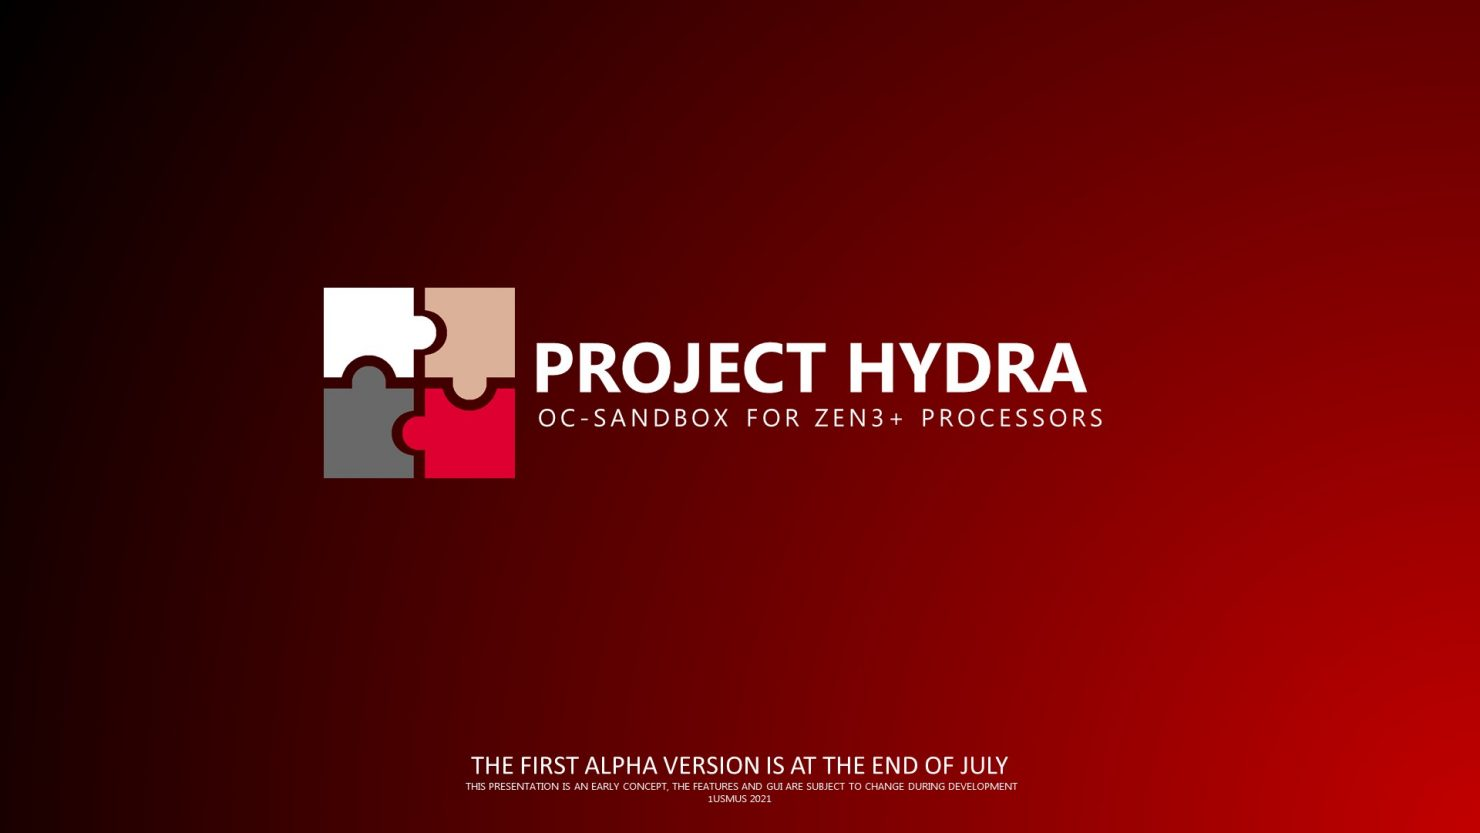 1usmus-unveils-project-hydra:-a-brand-new-overclocking-&-tuning-utility-for-amd-zen-3-&-zen-3+-ryzen-cpus